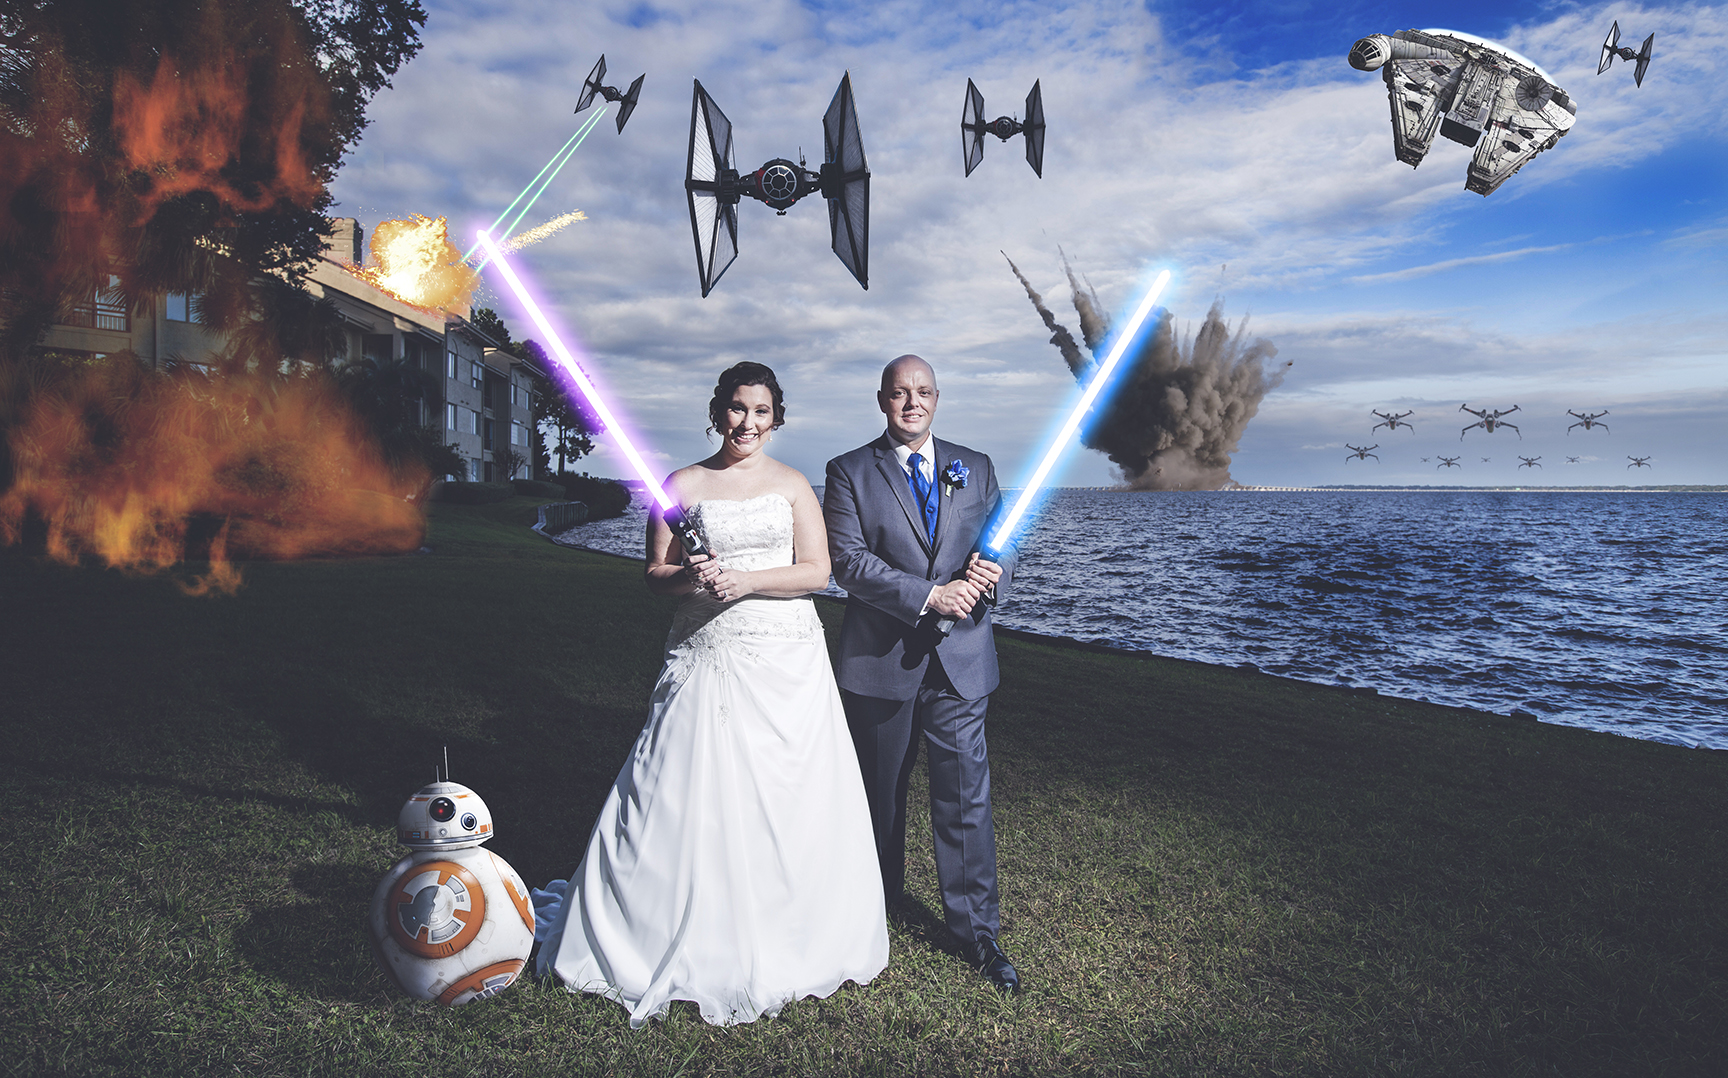 adam-szarmack-wedding-photographer-awesome-6.jpg